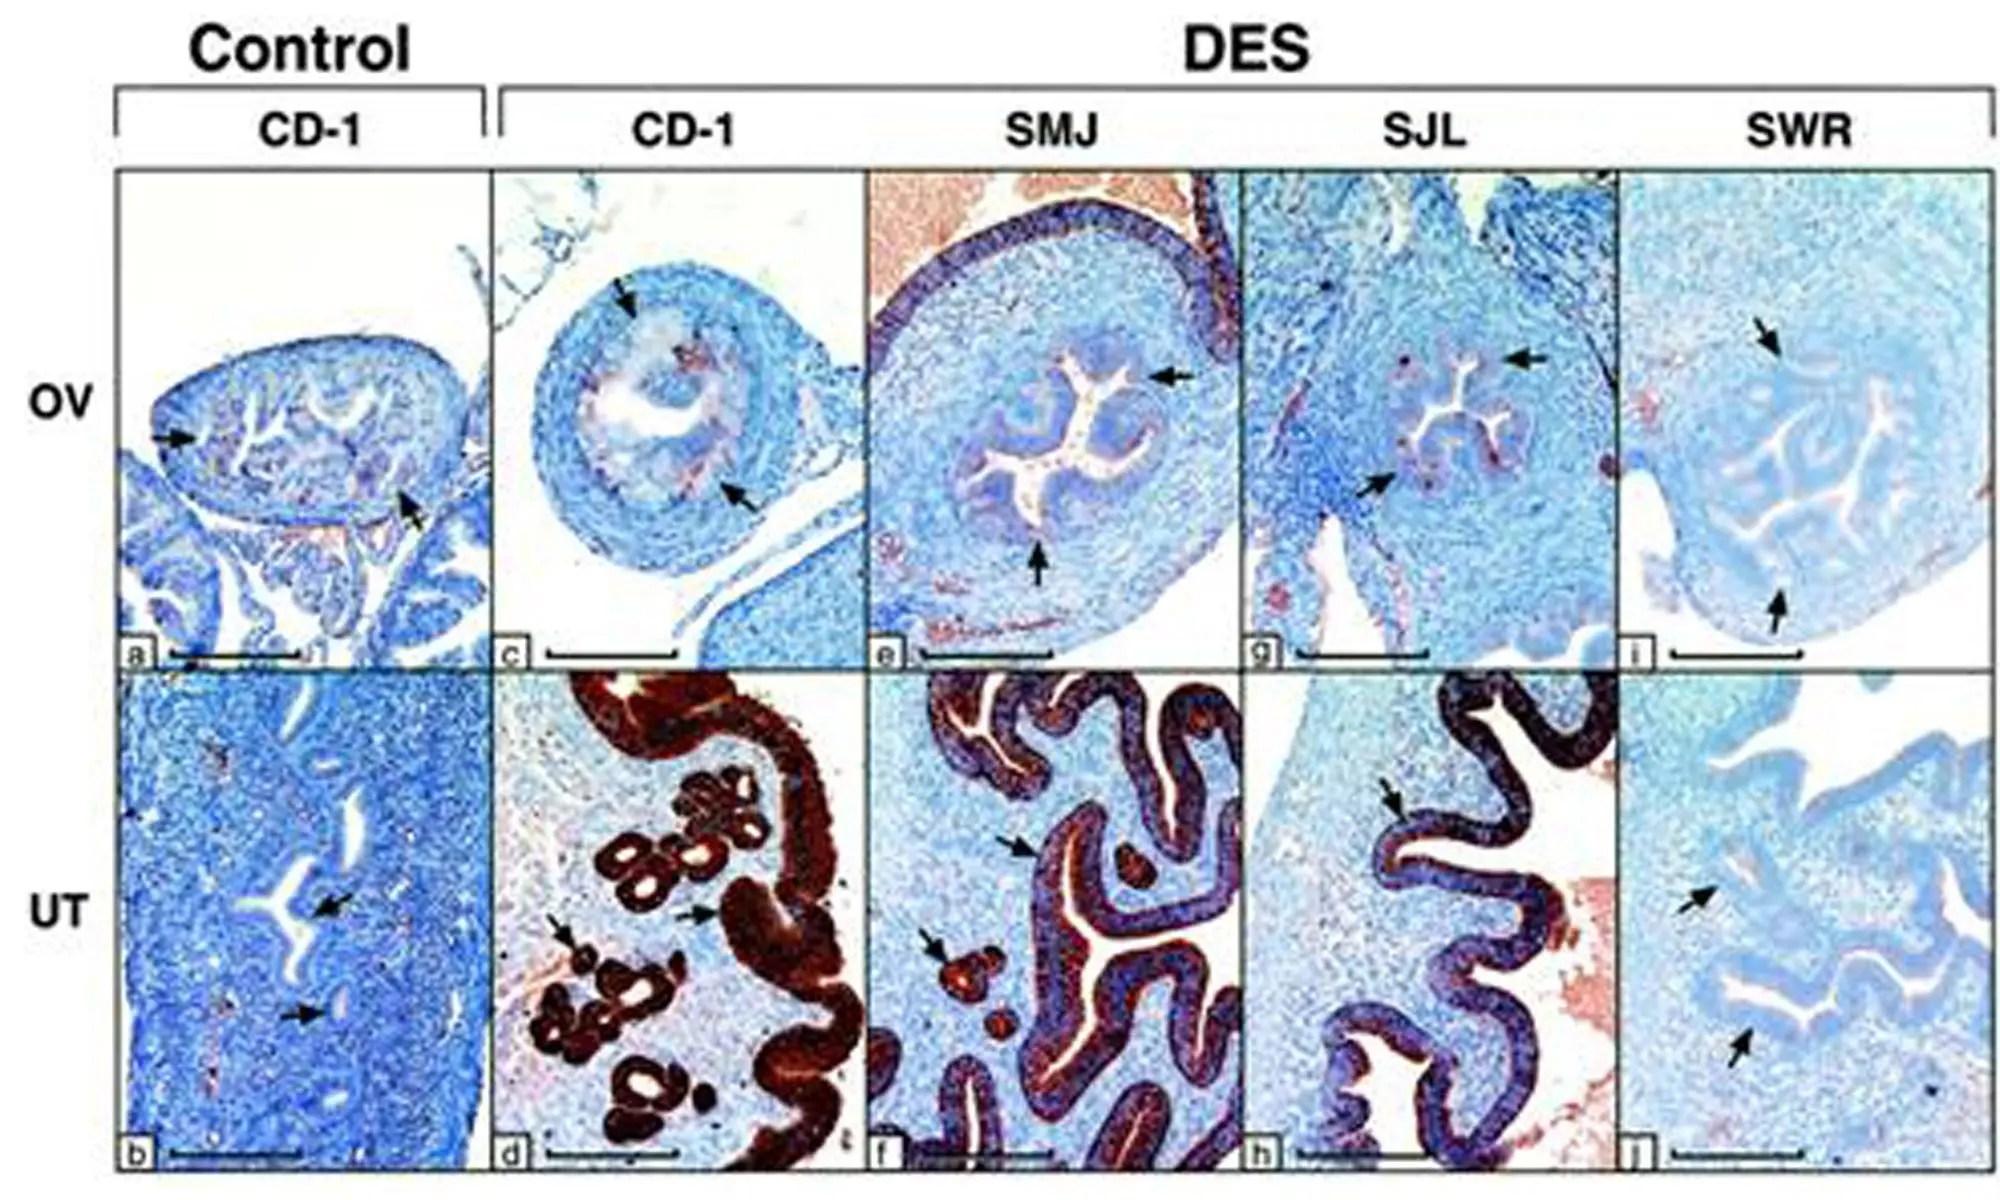 image of lactoferrin-gene and DES response